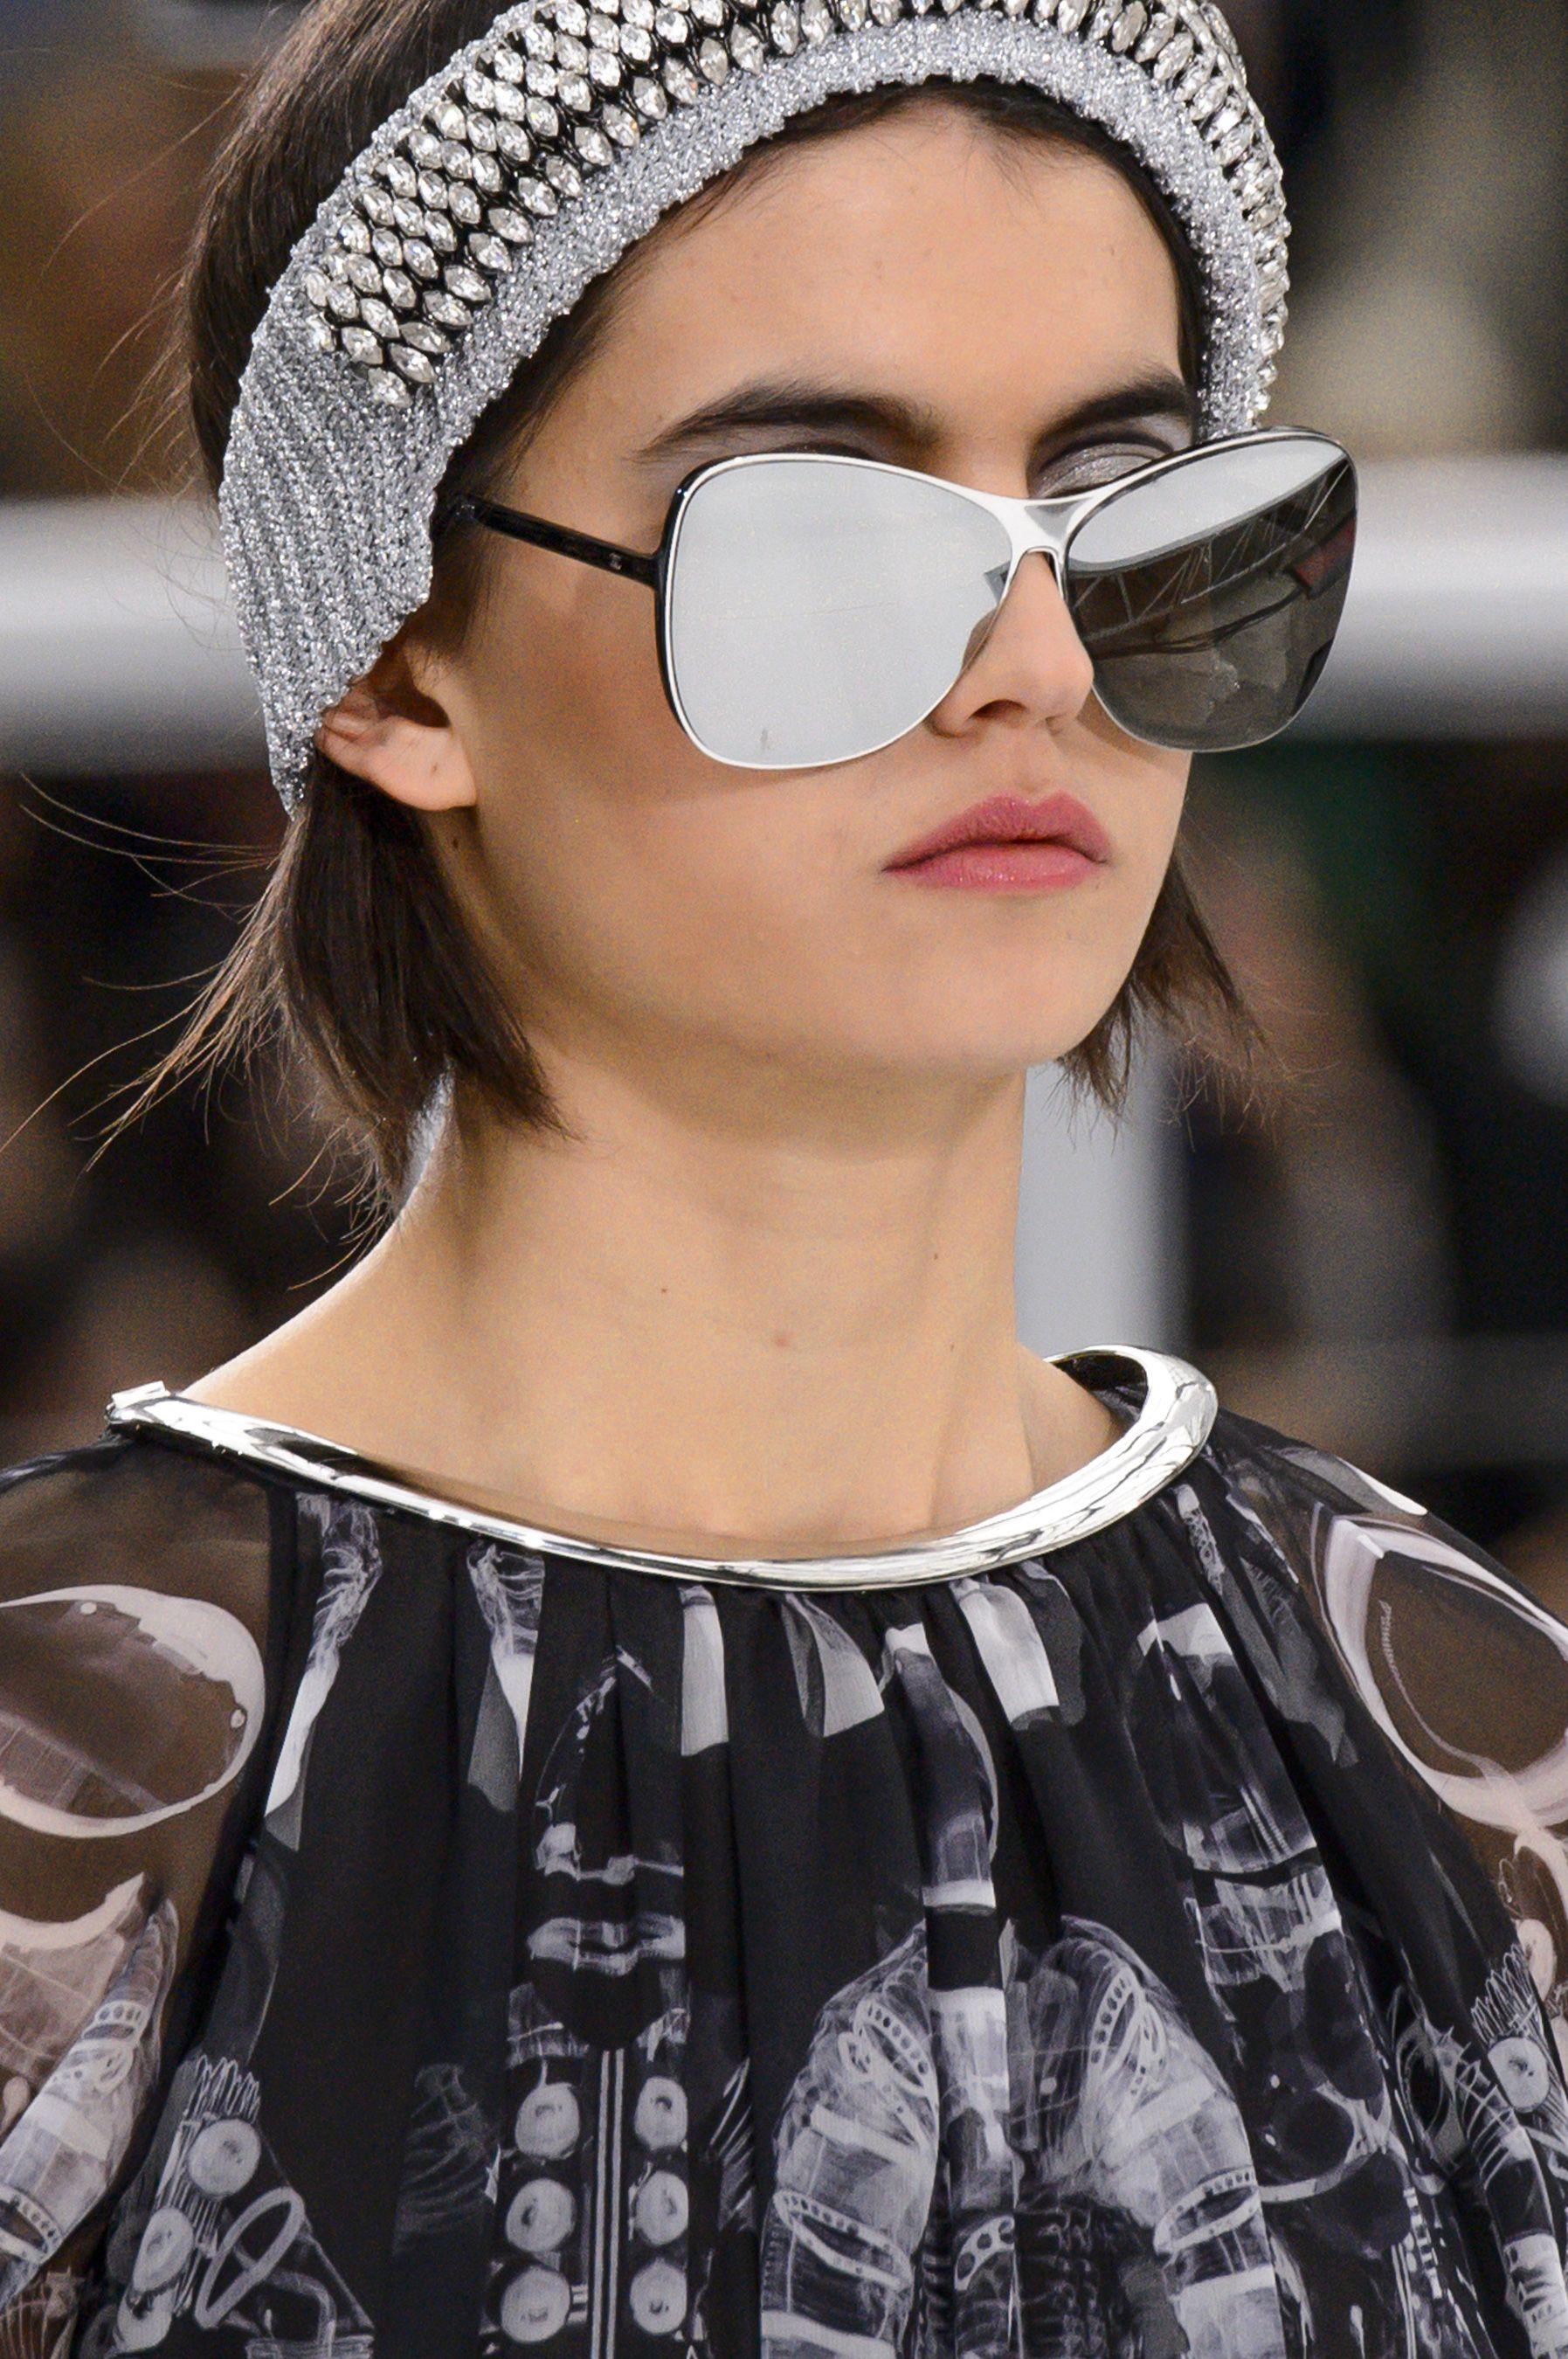 Chanel Fall 2017 Fashion Show Details - The Impression